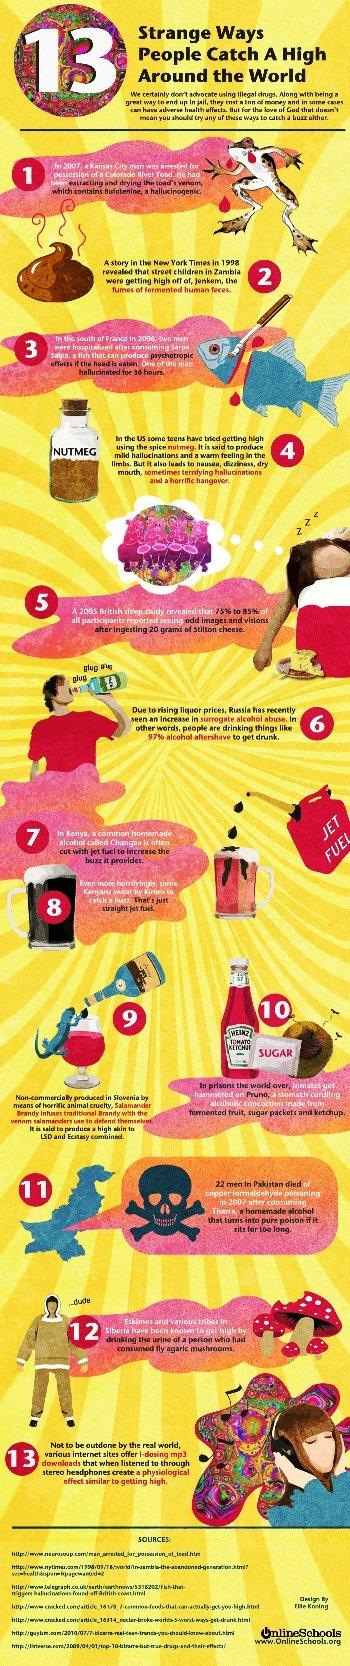 13 strange ways people catch a high around the world #infographic